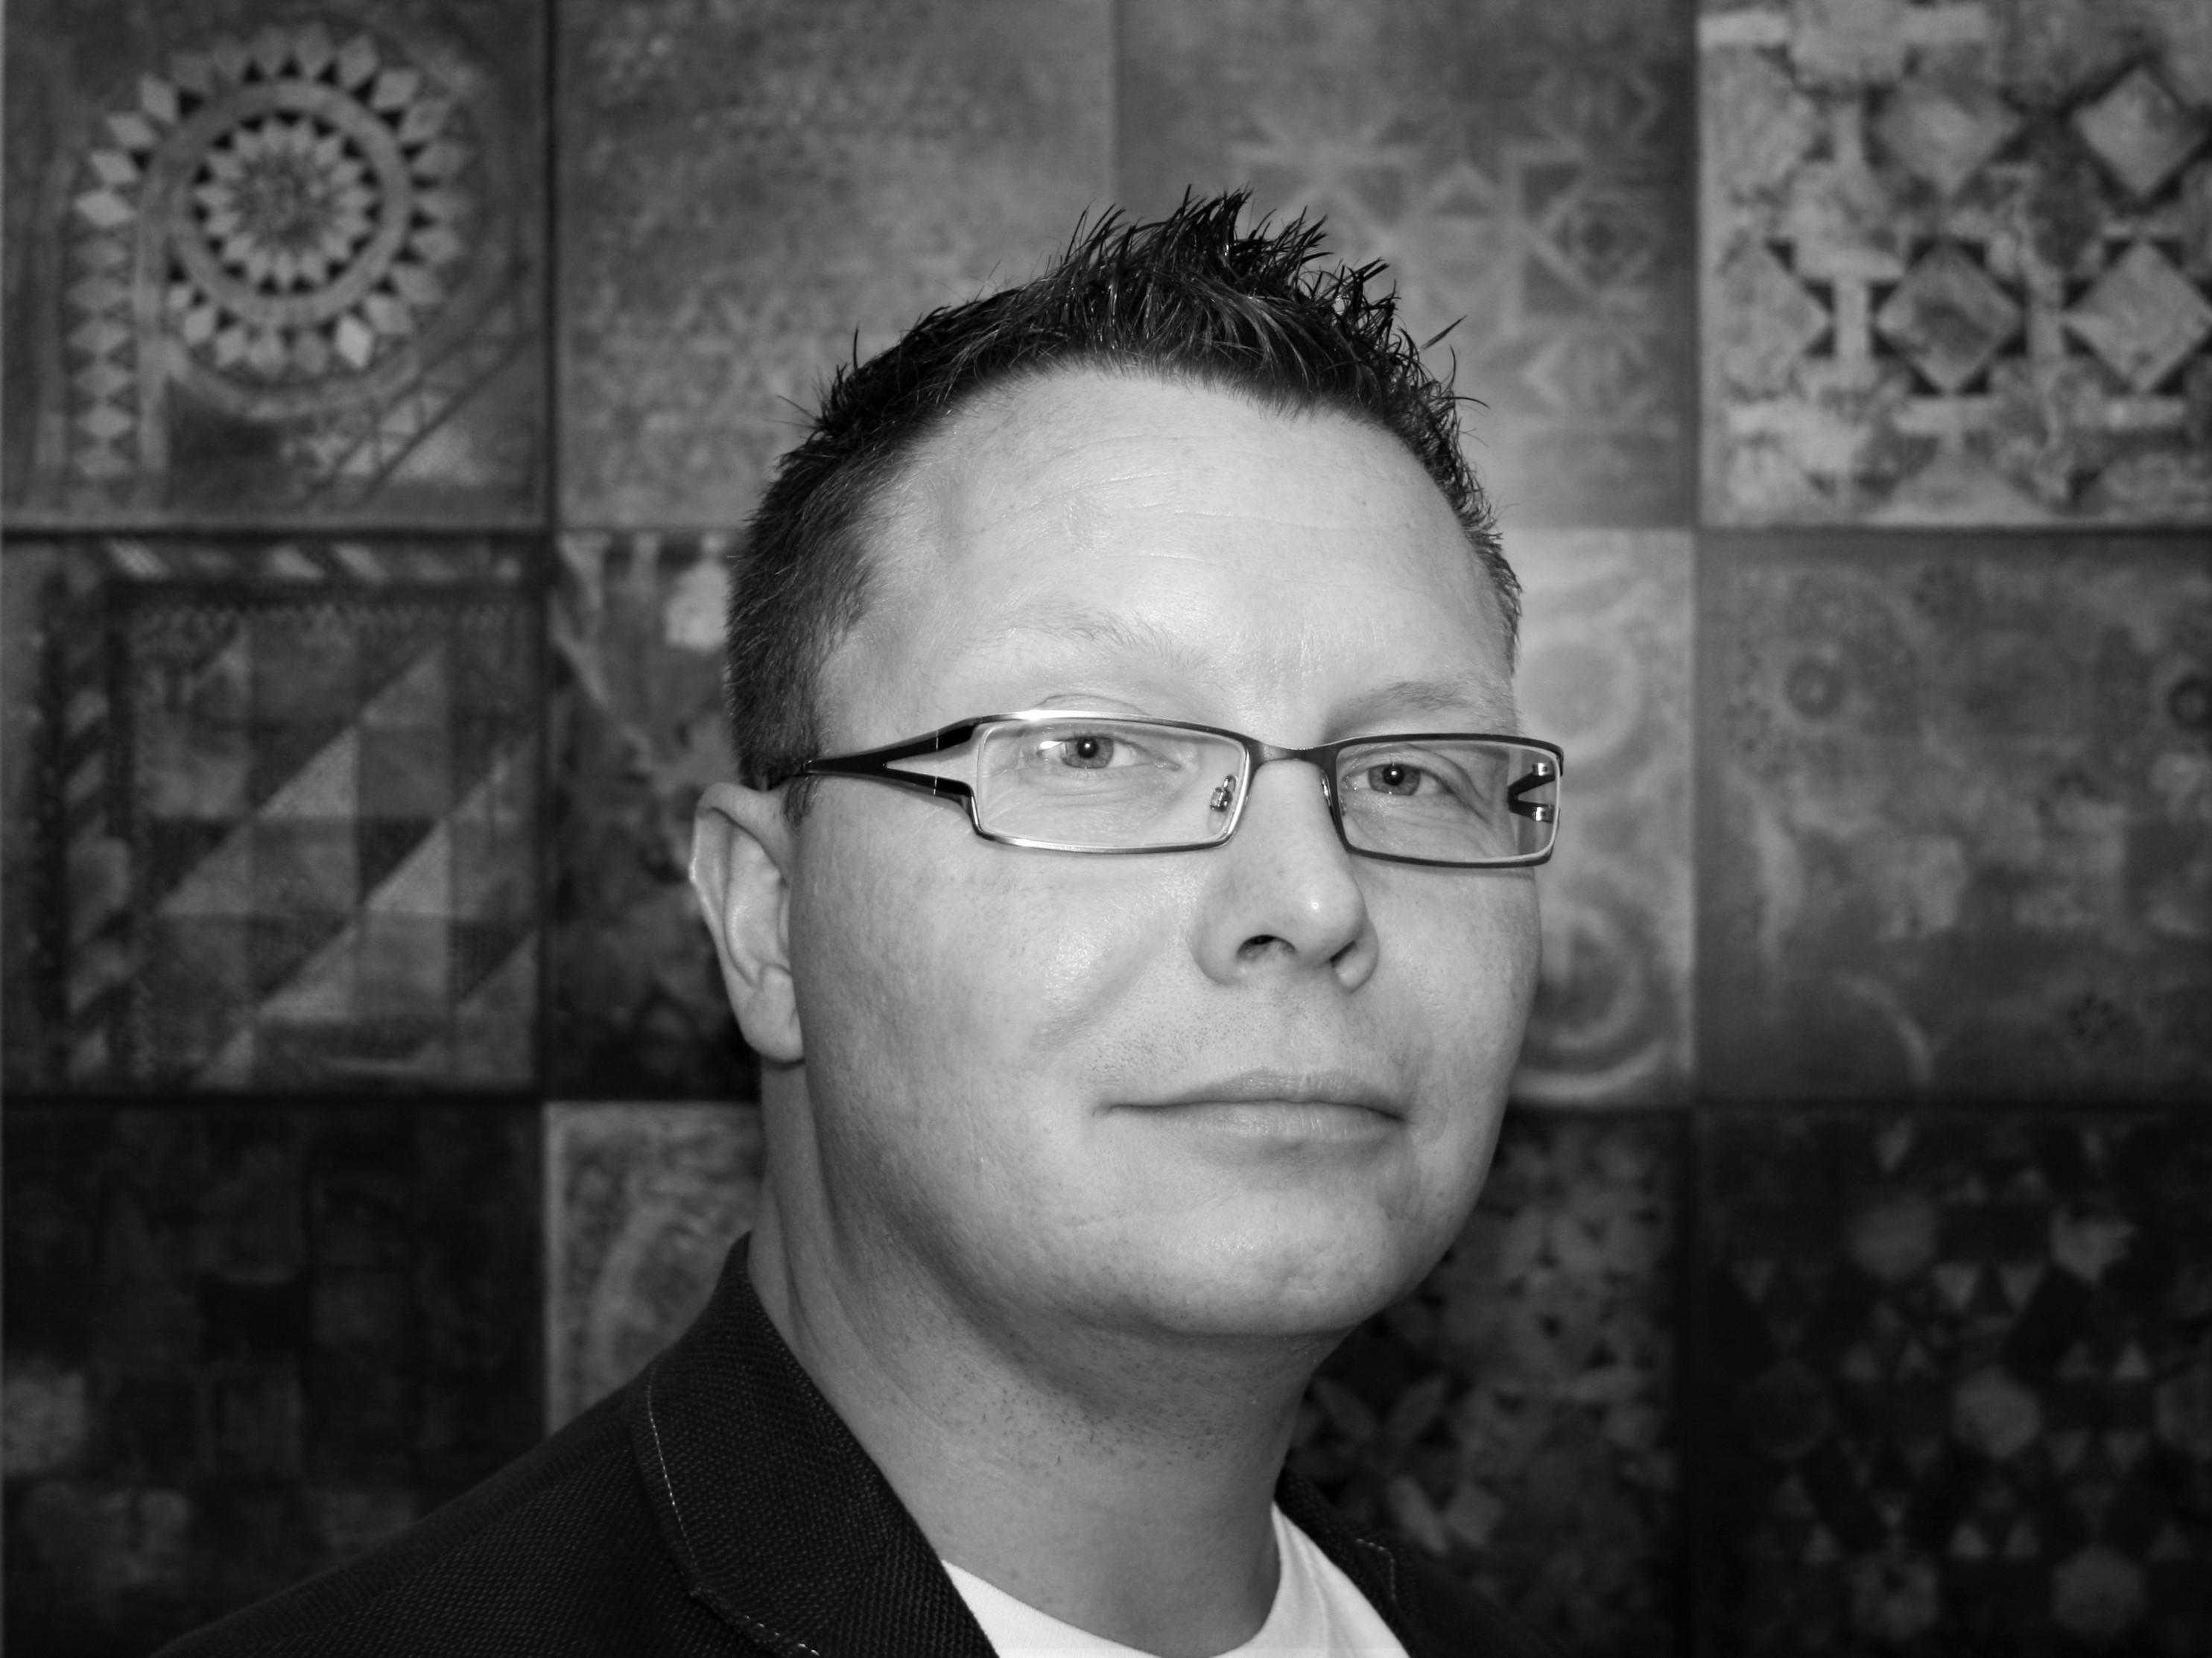 Erik van der Sloot Freelance ICT professional ITIL